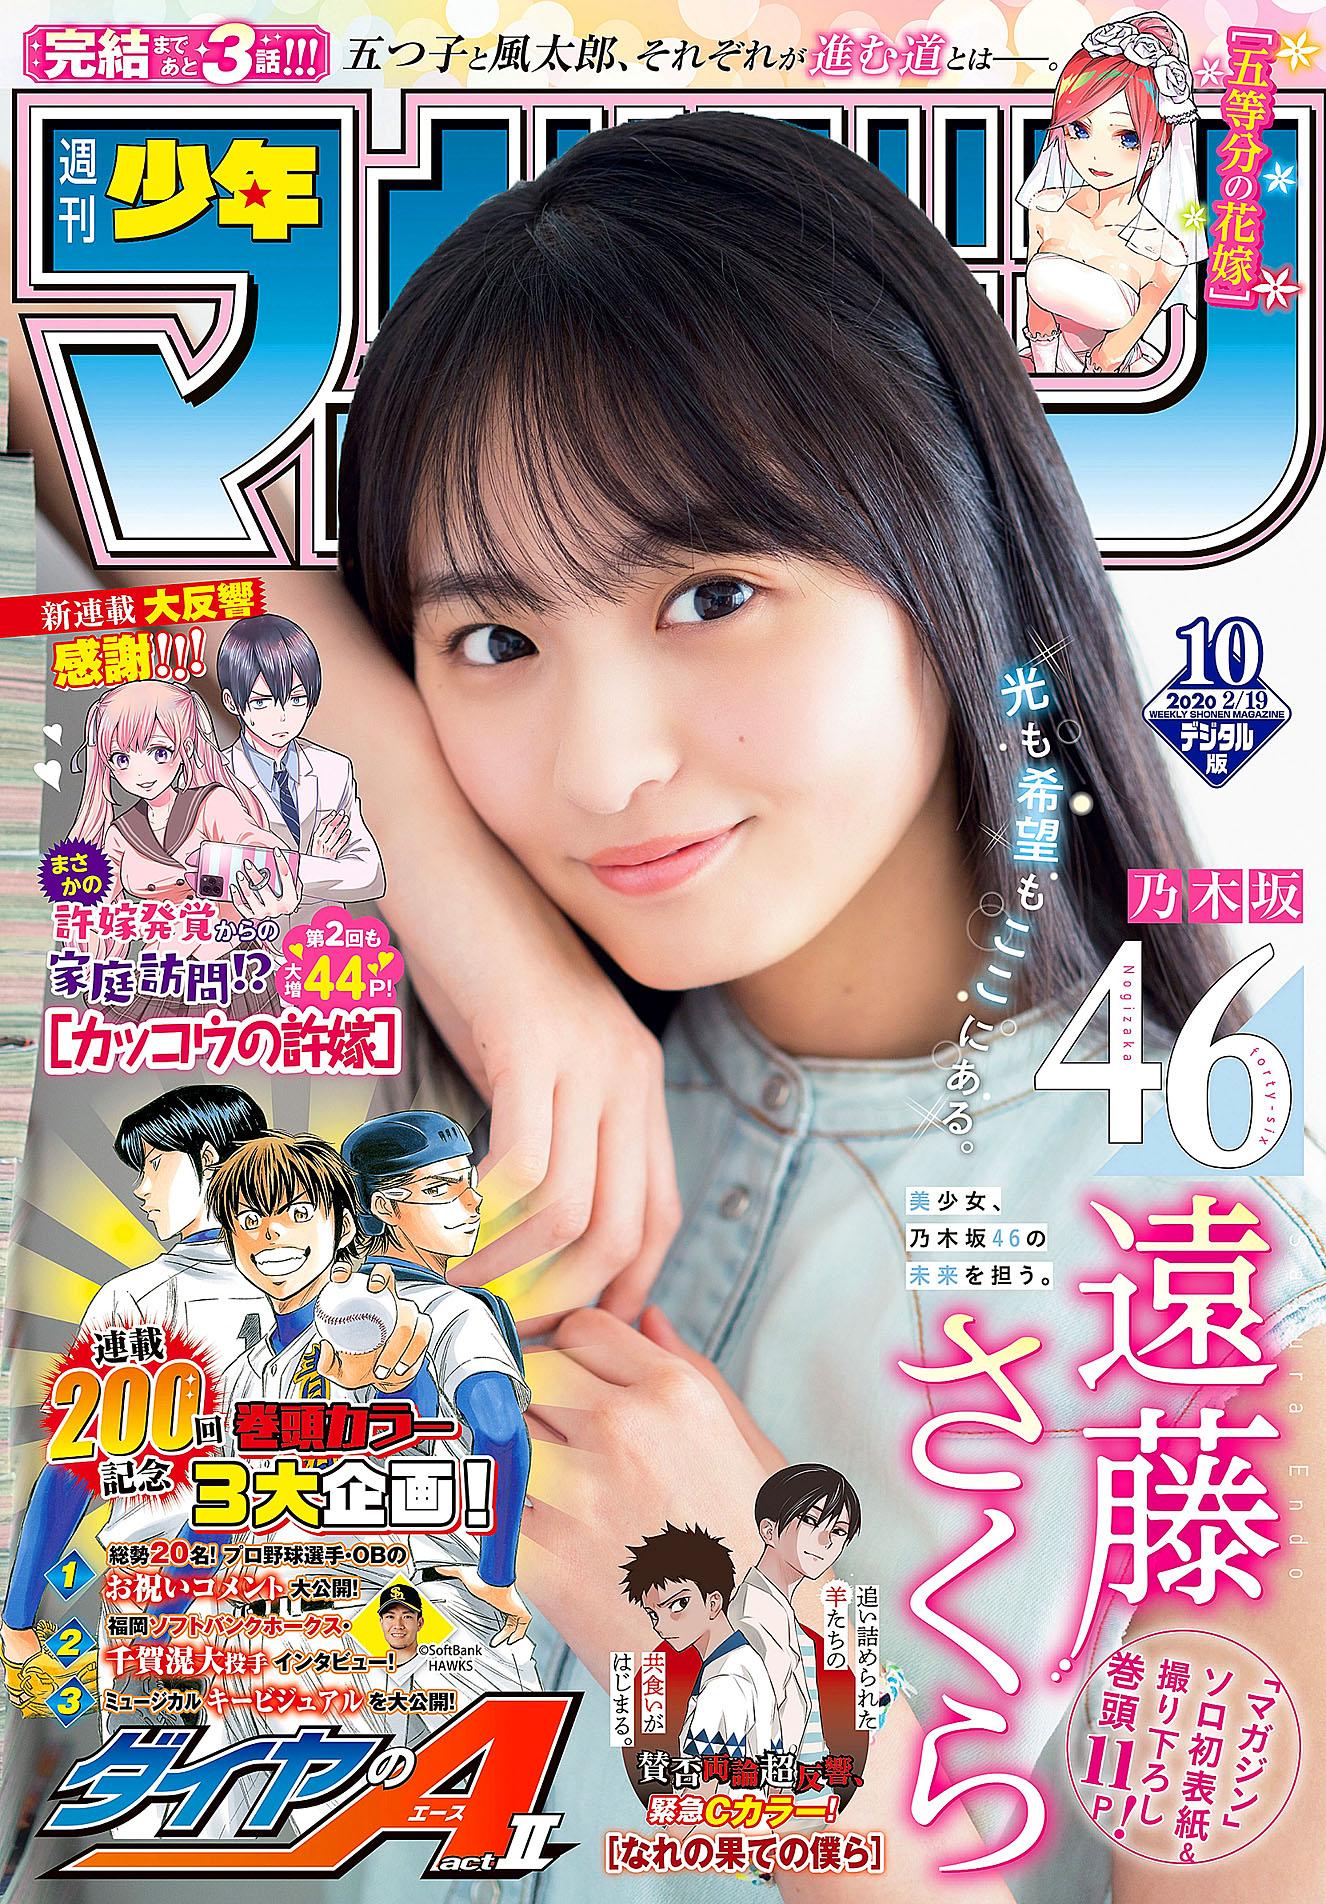 Endo Sakura N46 Shonen Magazine 200219.jpg